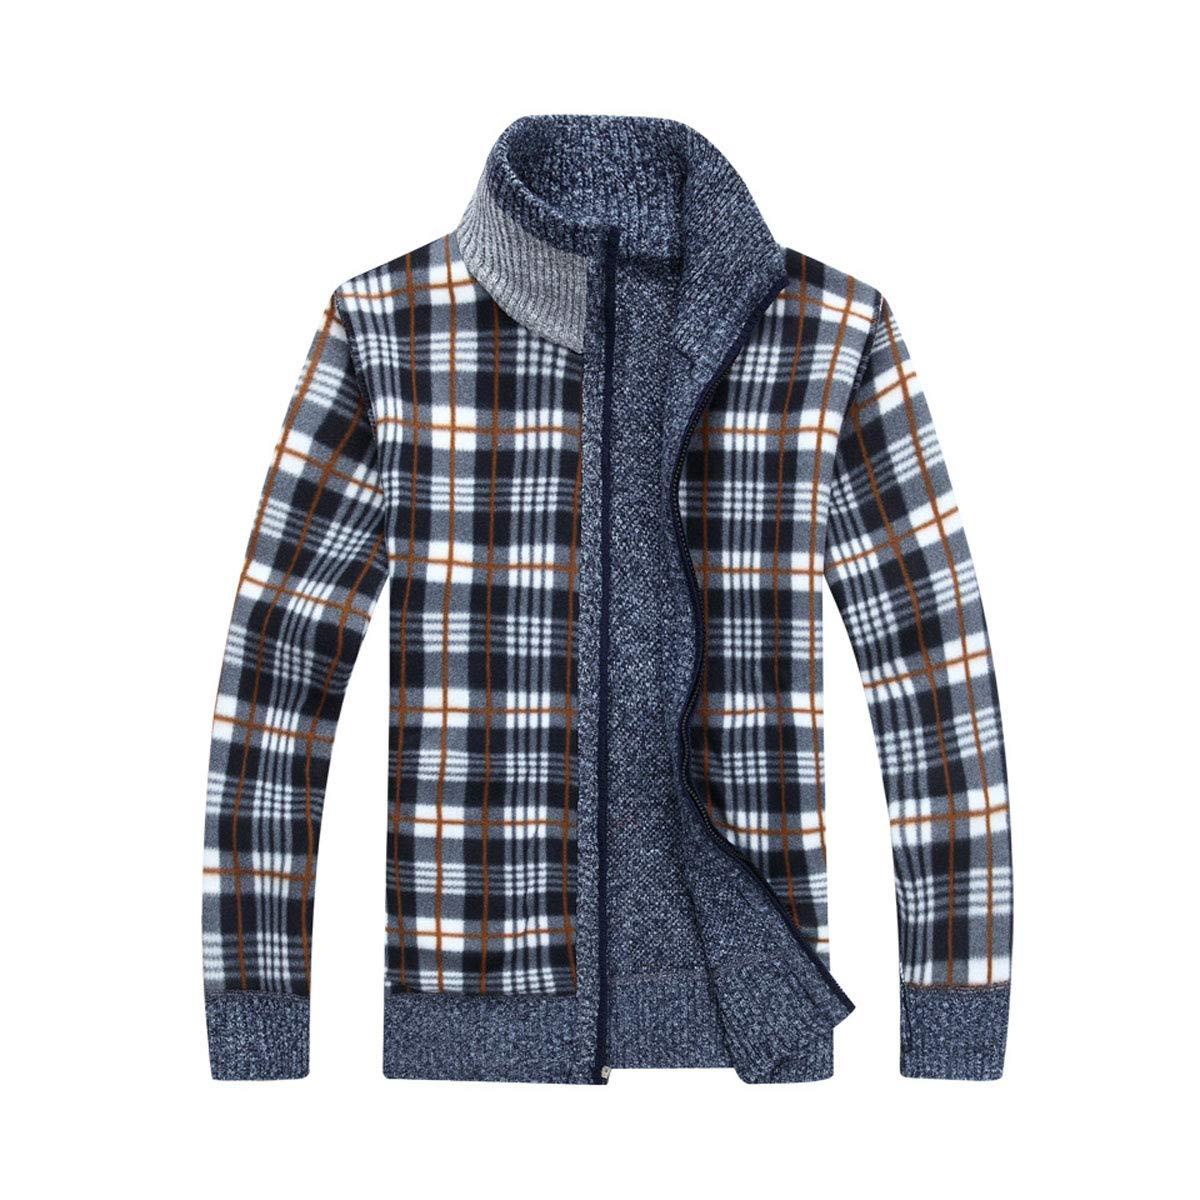 Friedman Mens Fleece Cardigan Sweater Warm Cashmere Dress Slim Fat Wool Zipper Casual Knitted Coat